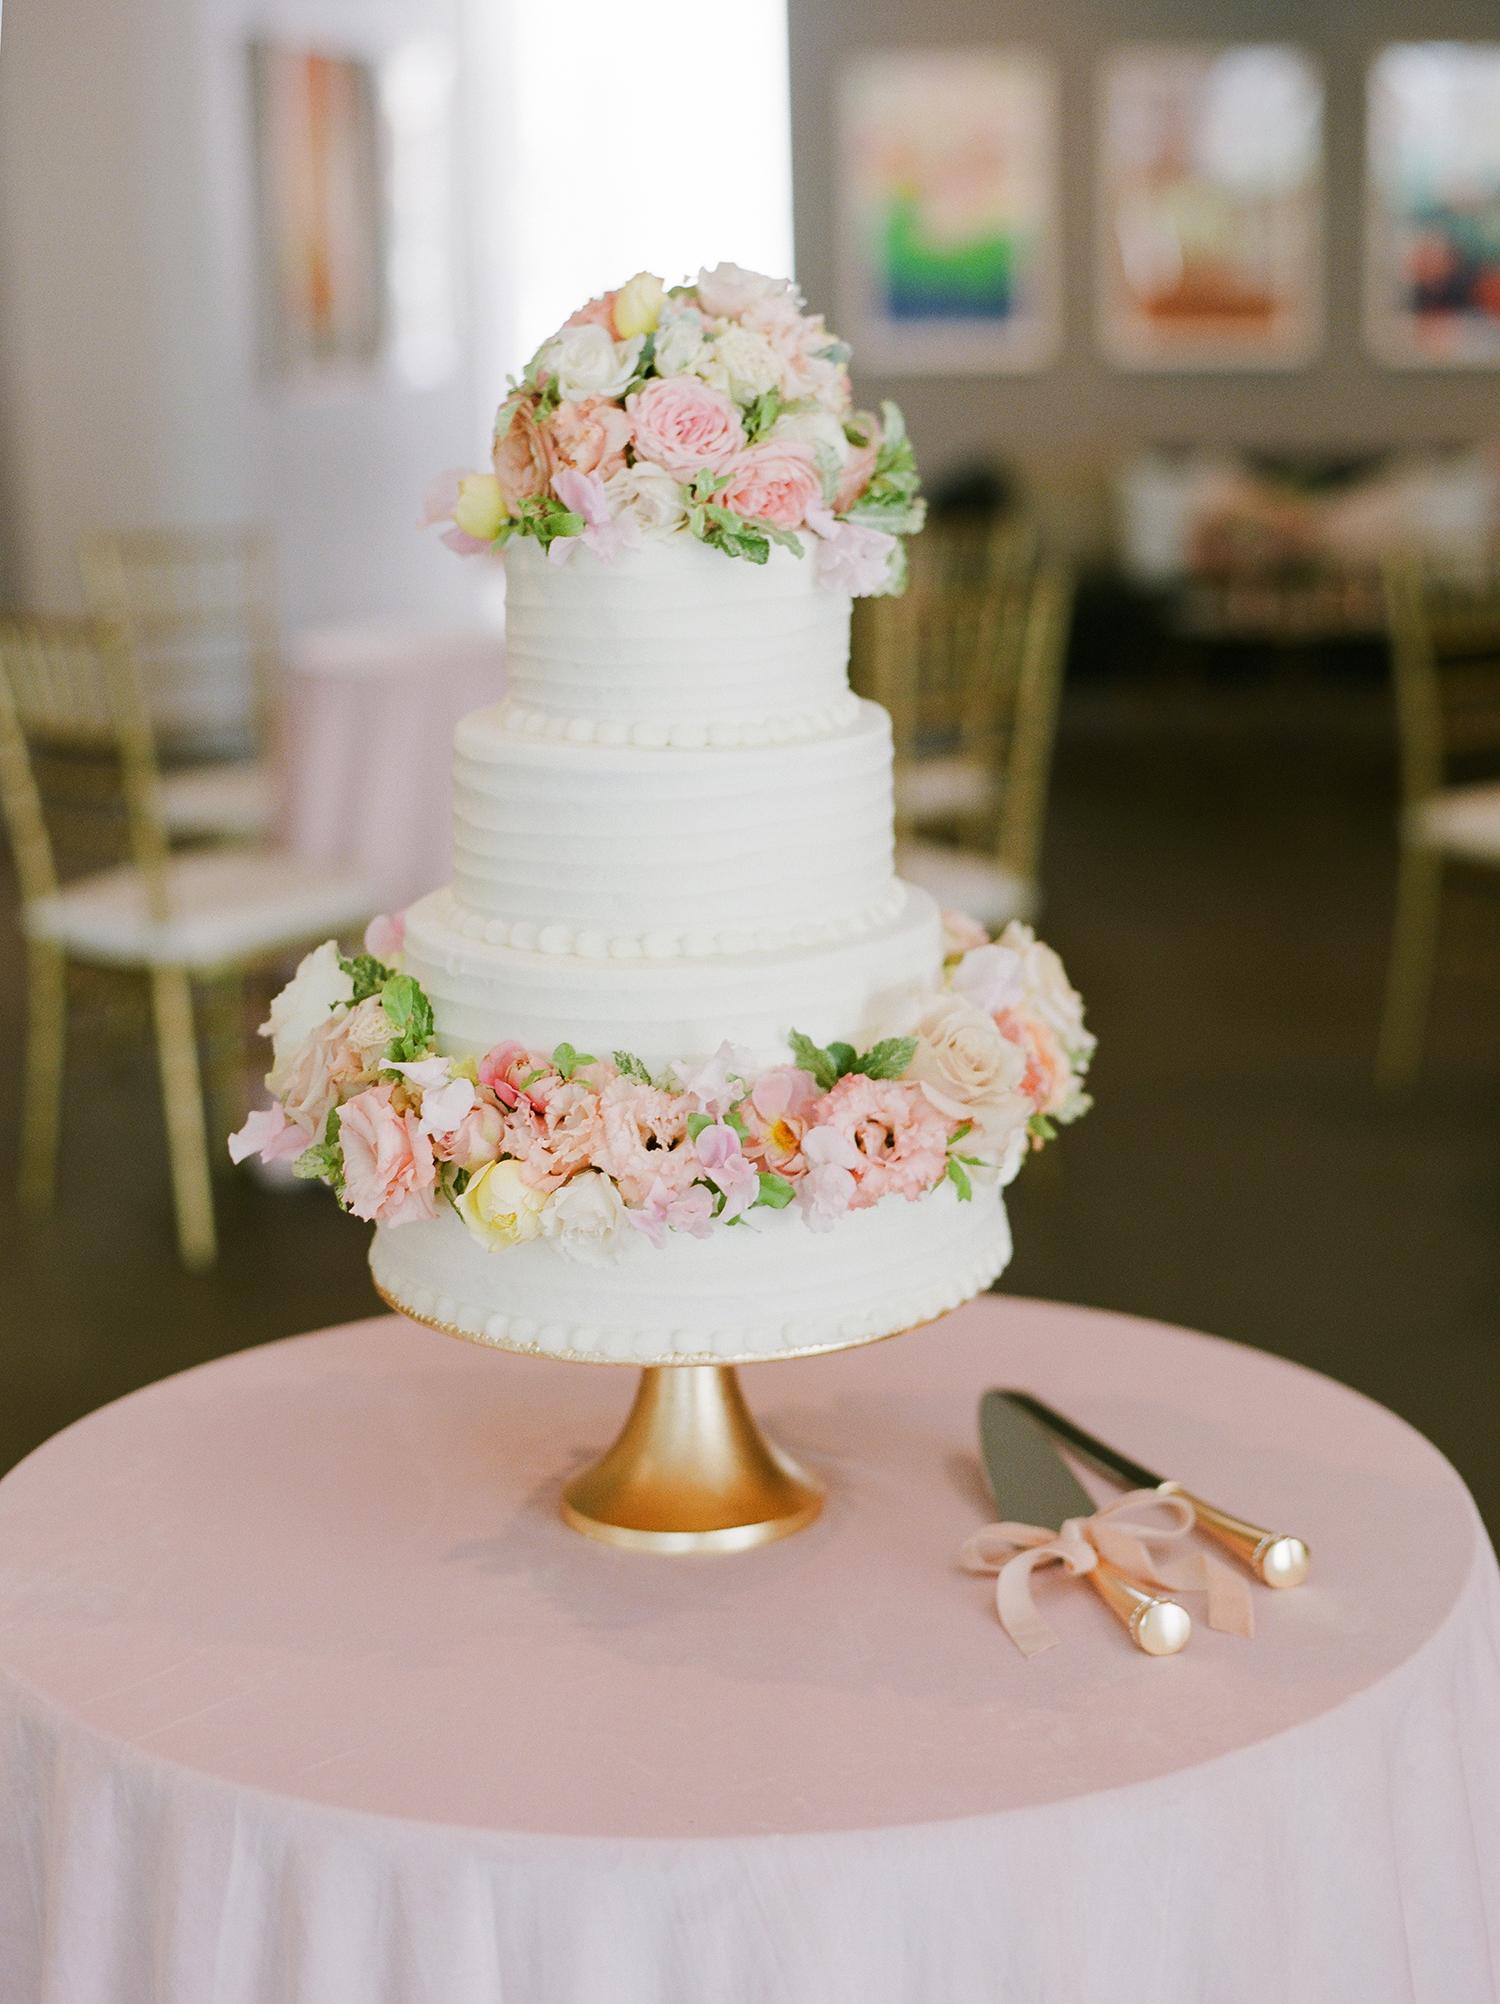 anwuli patrick wedding pastel cake on golden stand